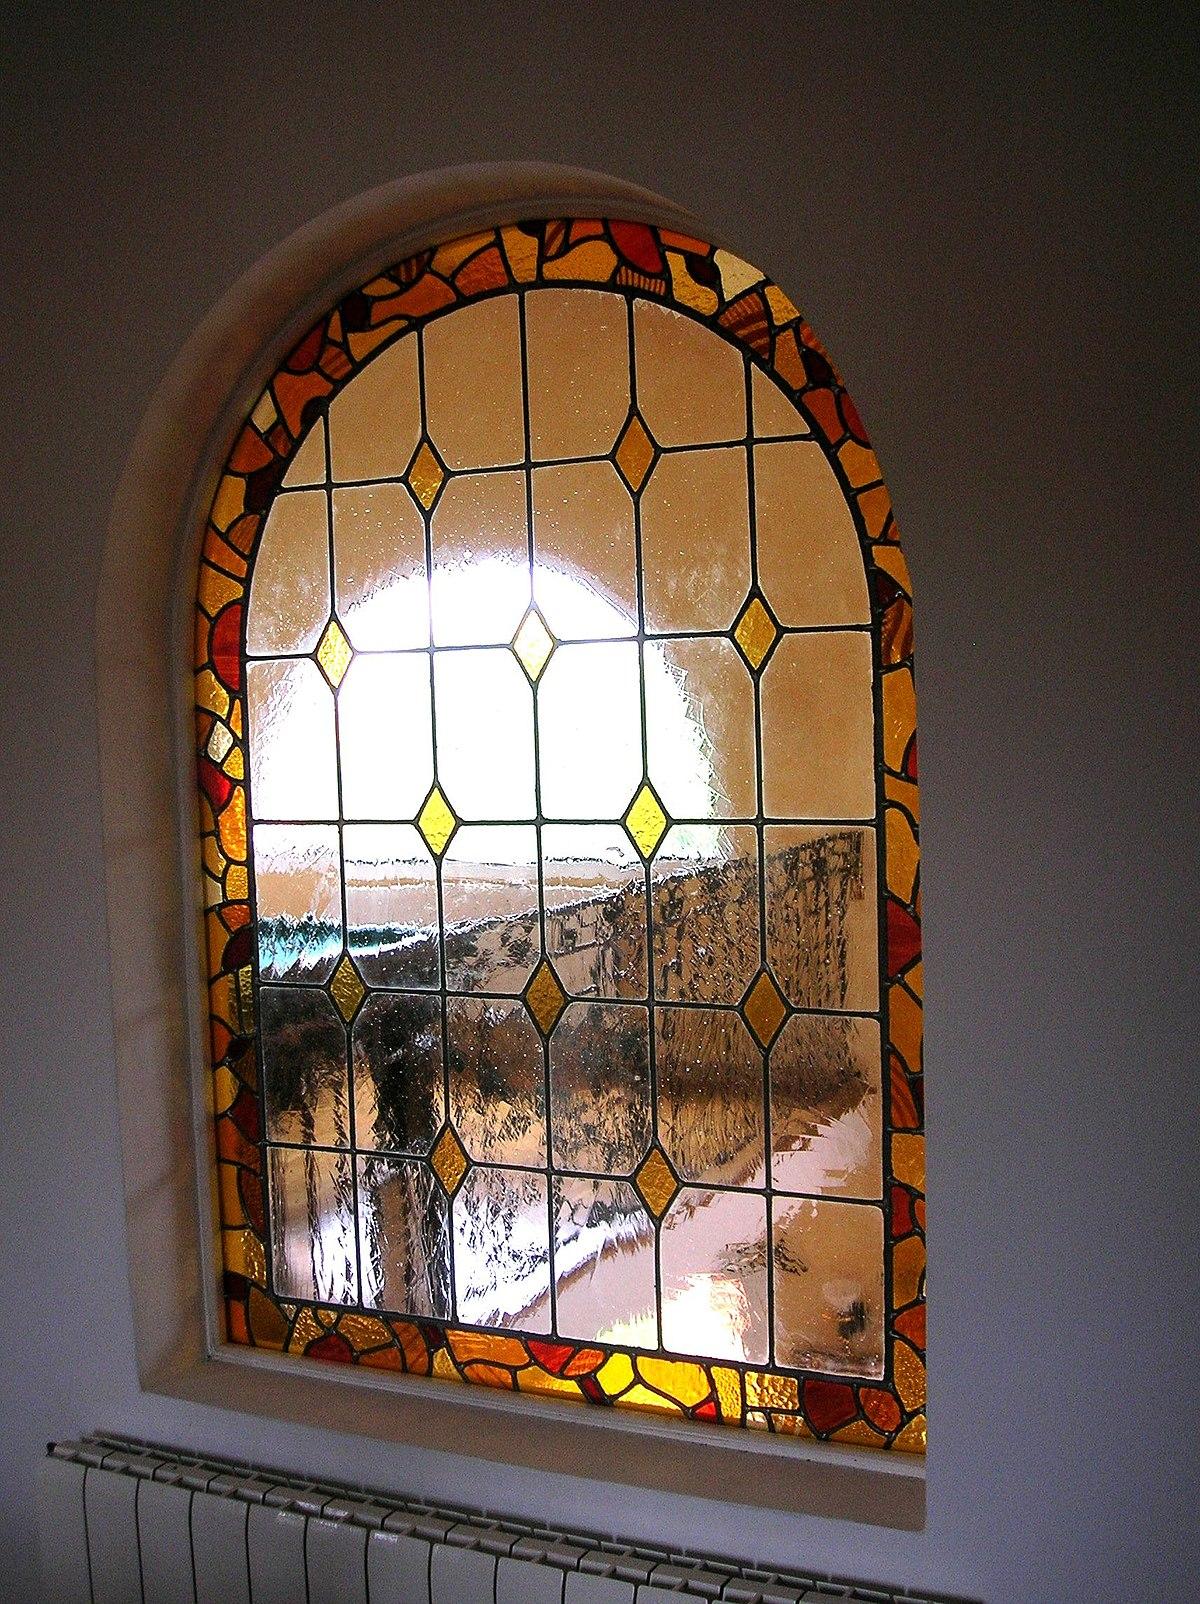 vitrerie  u2014 wikip u00e9dia